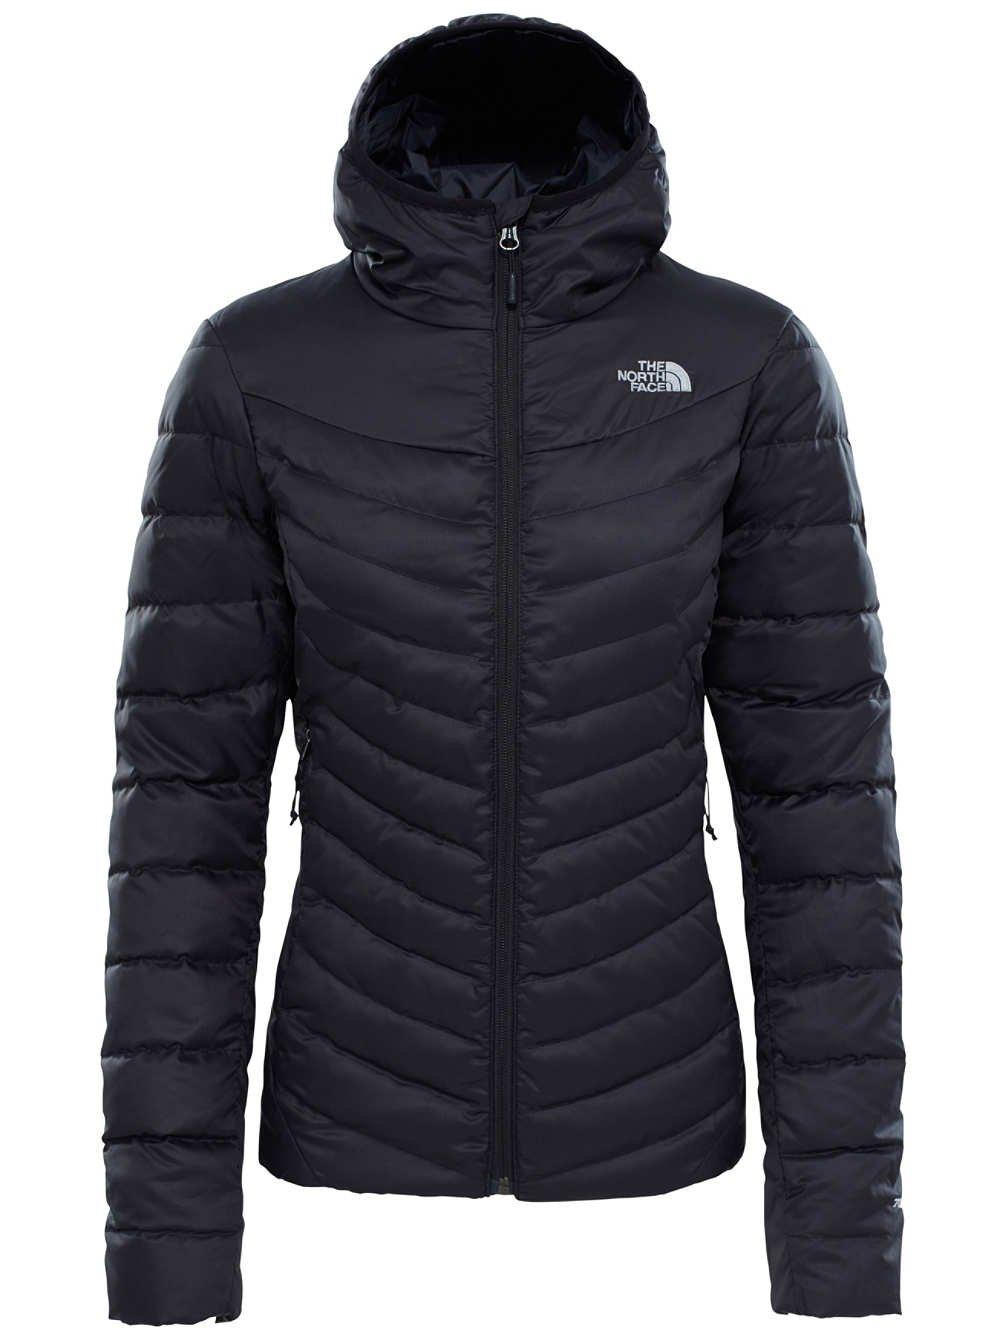 616Th2yN1RL - North Face Women's W Tanken-Insulated Hooded Jacket, M